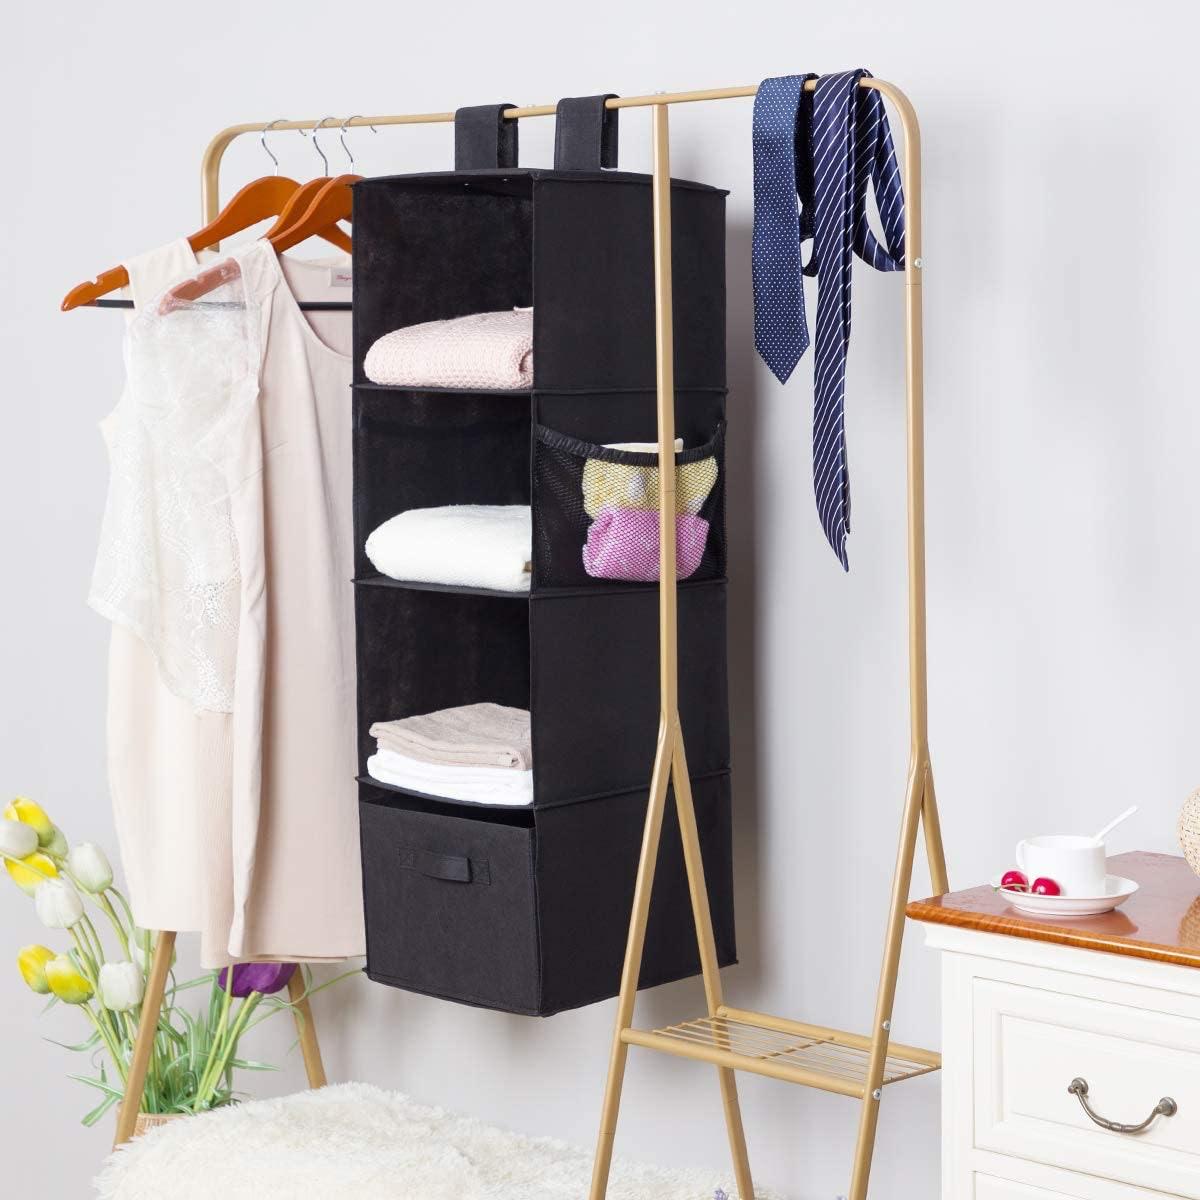 MustQ Hanging Closet Organizer